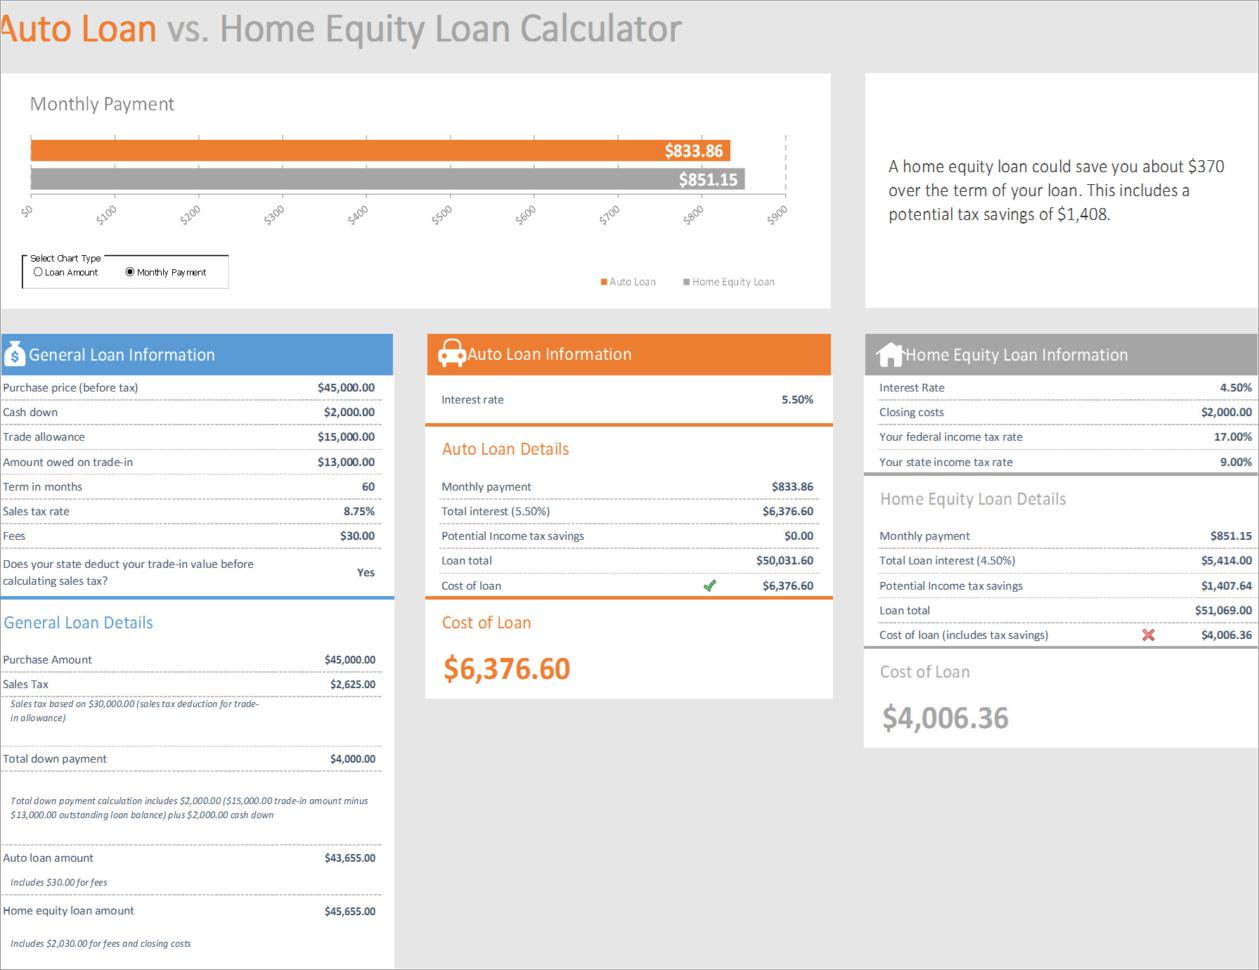 Pcp Car Finance Calculator Spreadsheet Within Cost Of Borrowing Car Loan Calculator  My Spreadsheet Templates